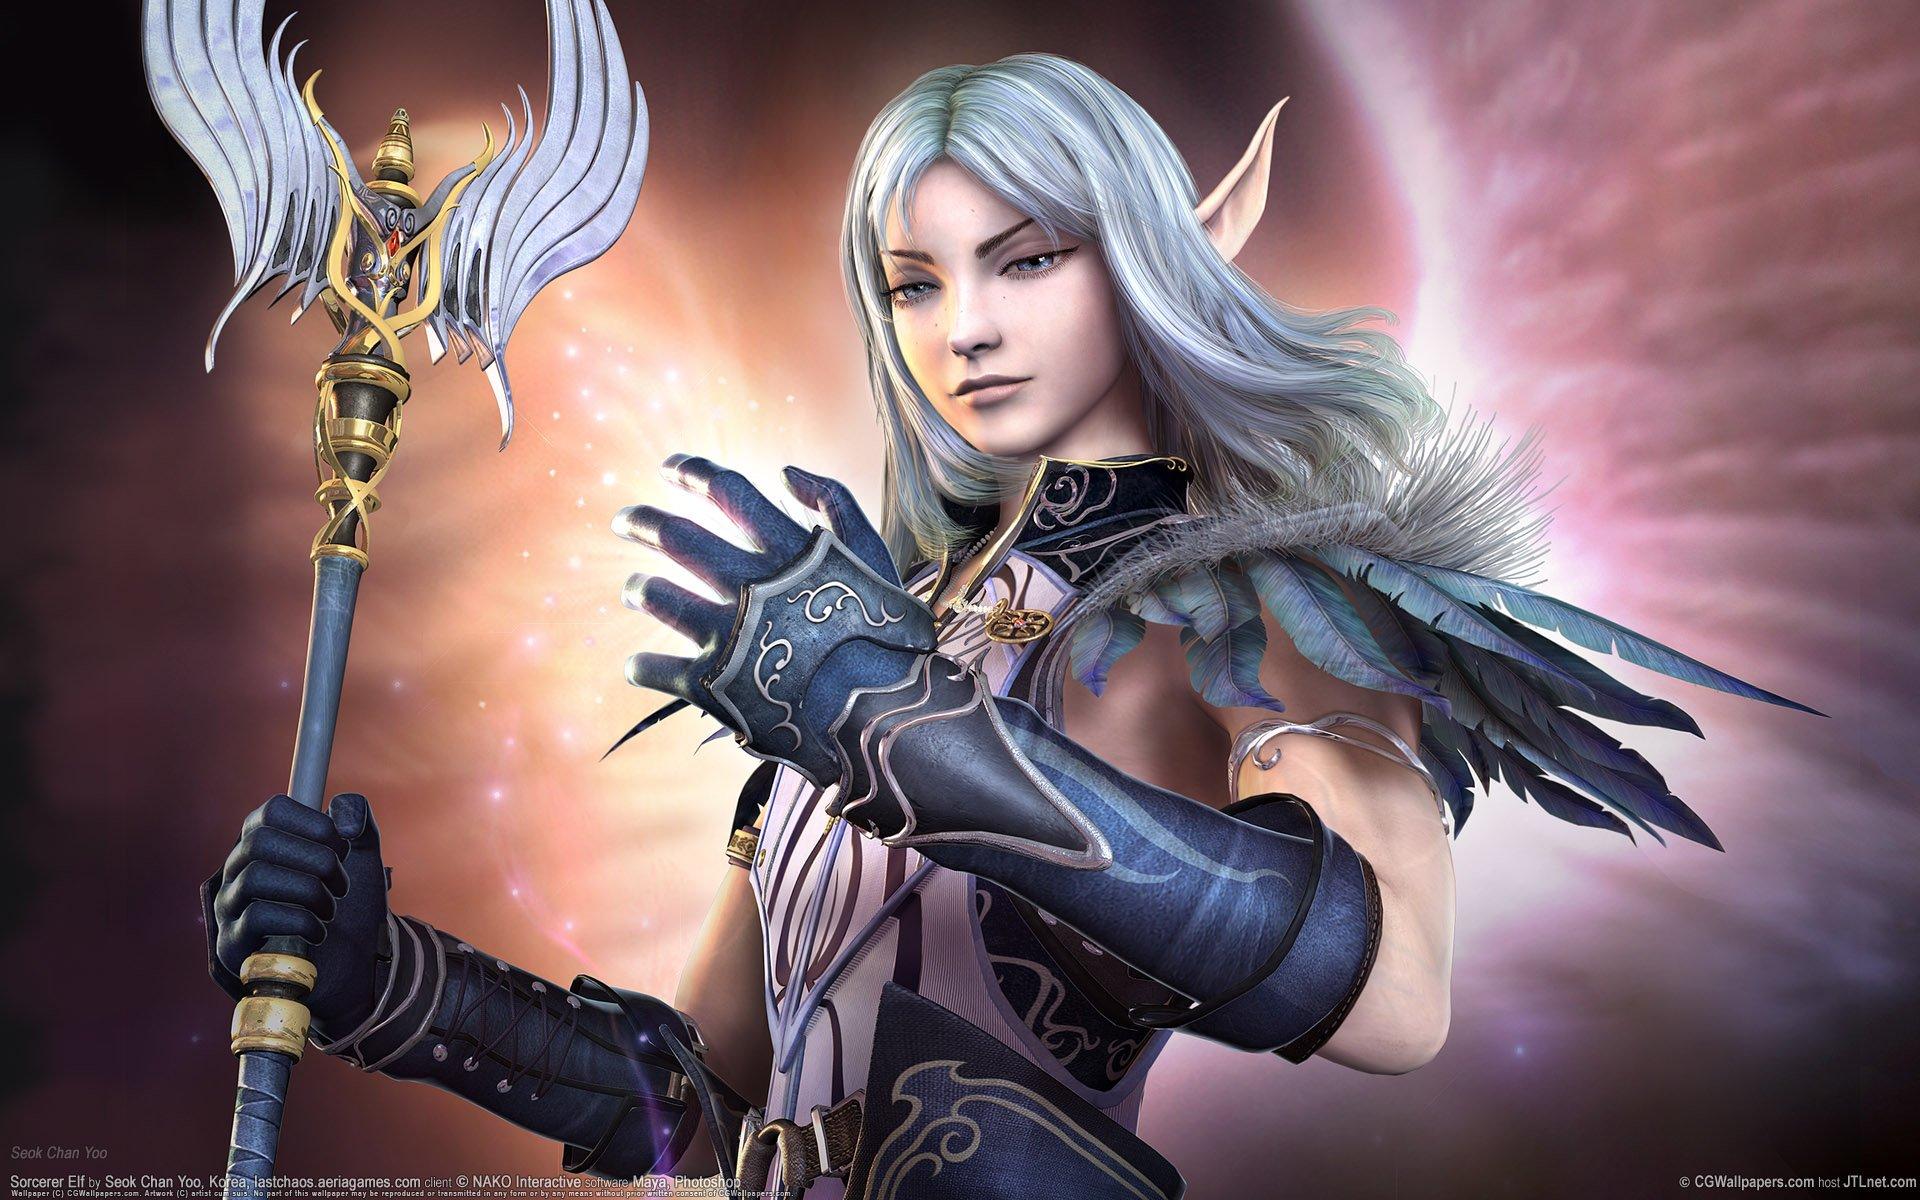 Sorcerer Elf 3d girl elf fantasy girl 1920x1200